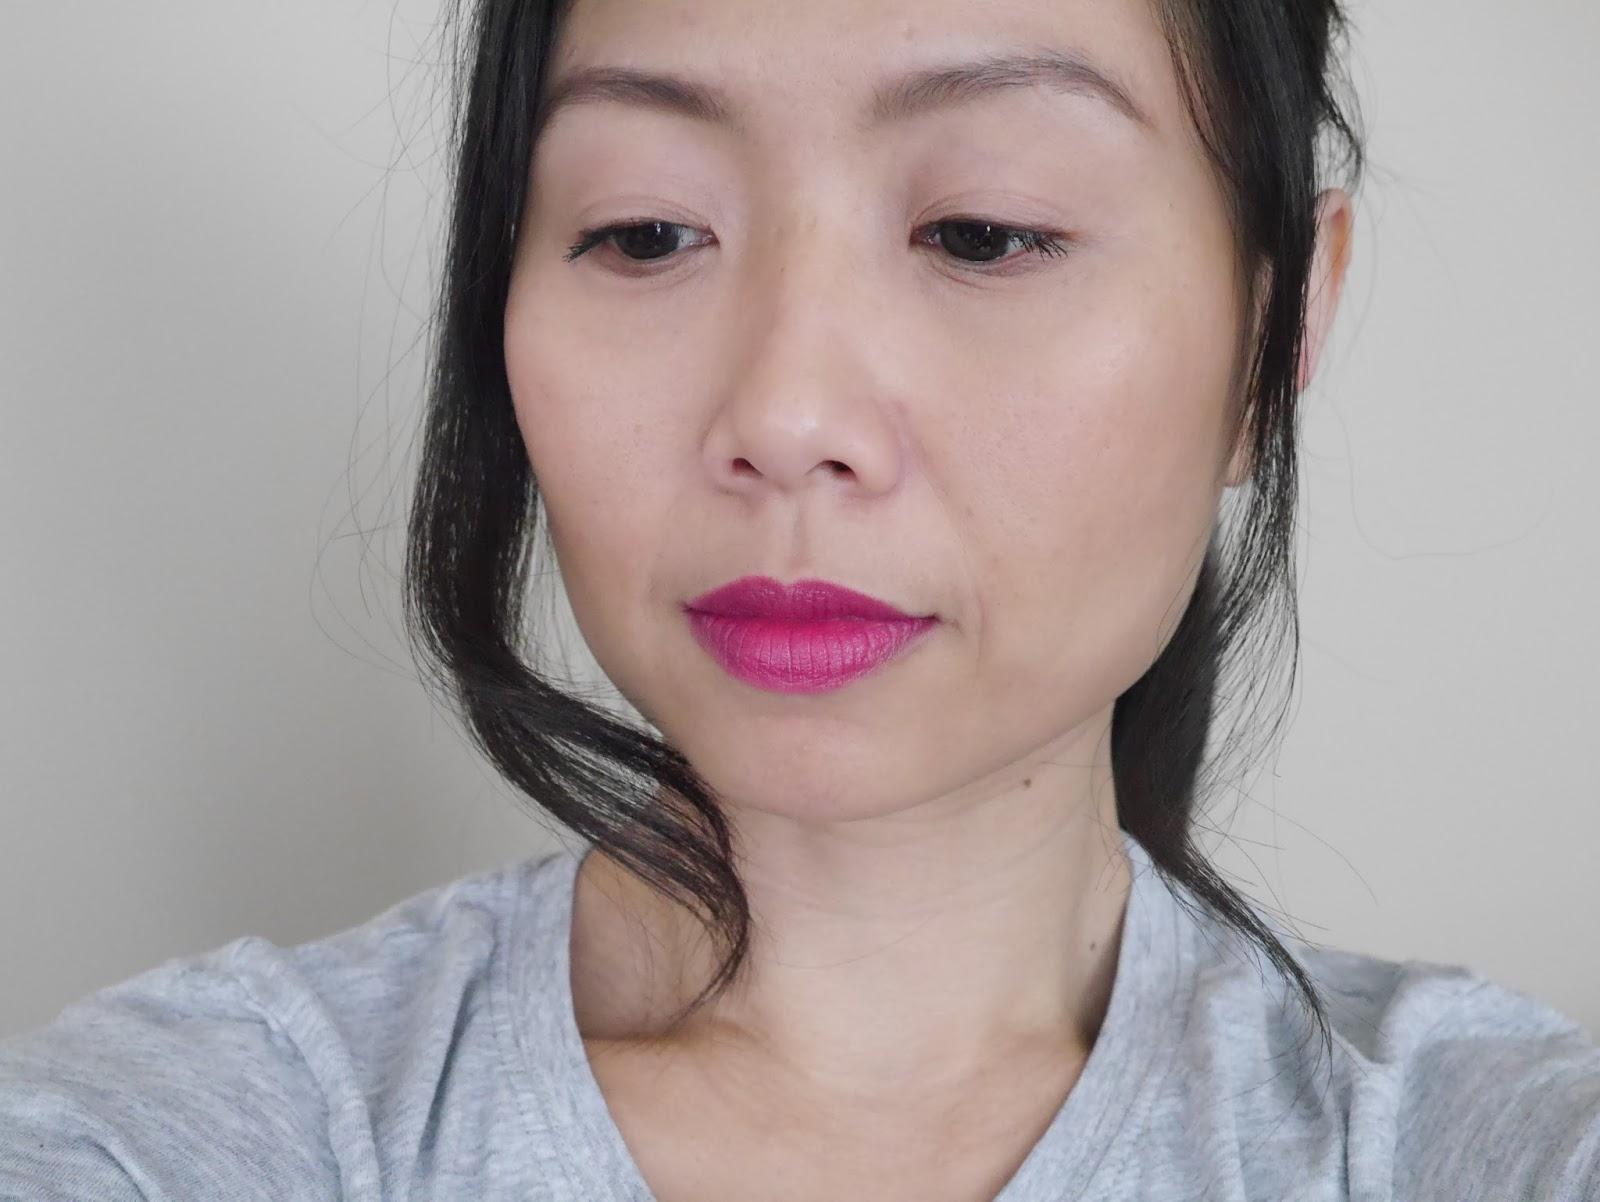 Tinted Day Cream, Bronzing Tint